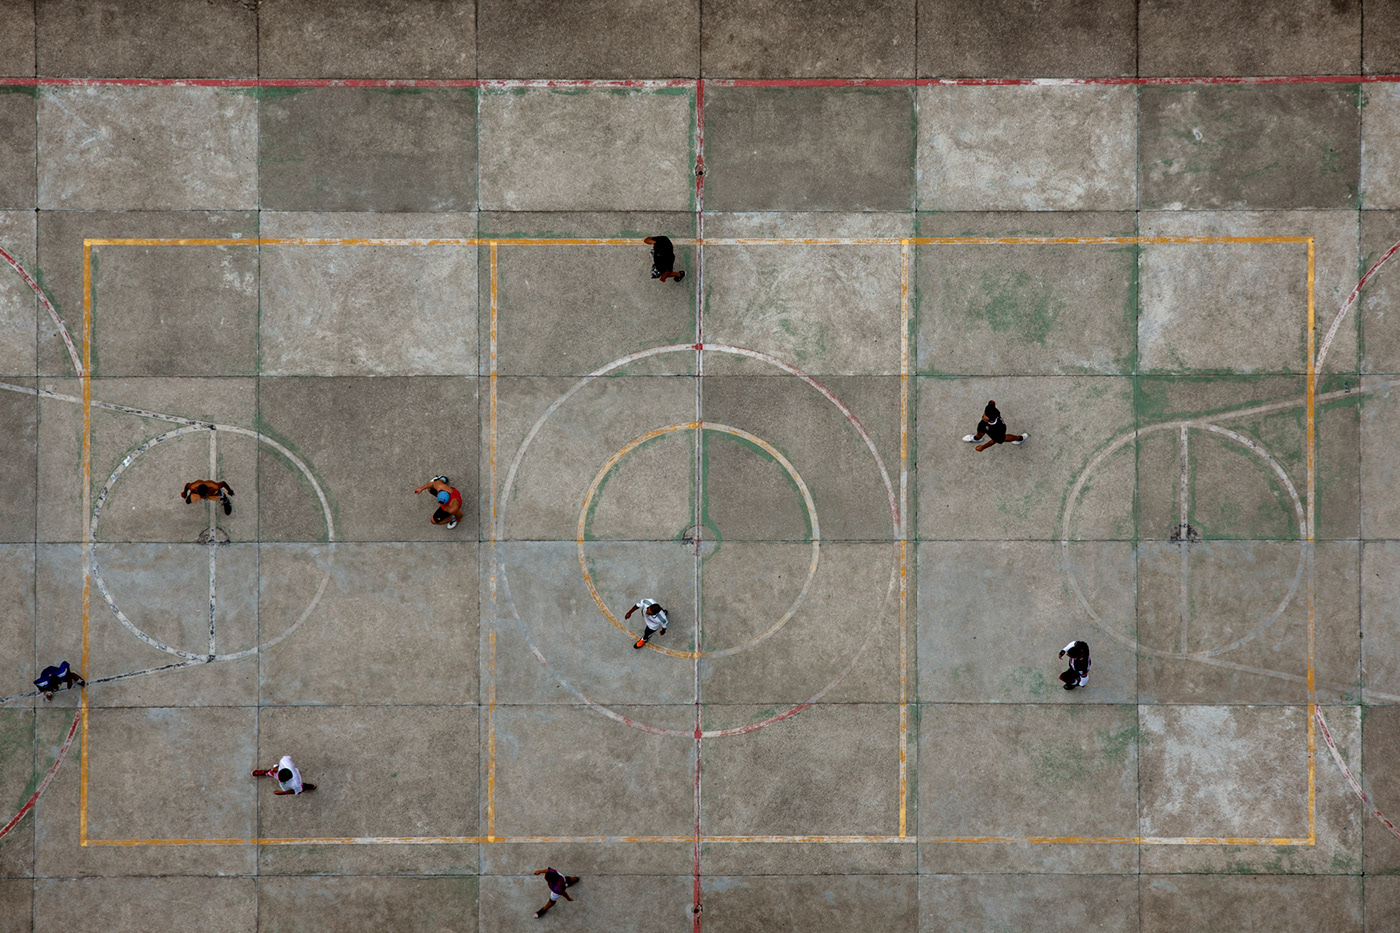 soccer football aerial pictures slum são paulo Leisure Brazil Brasil sports